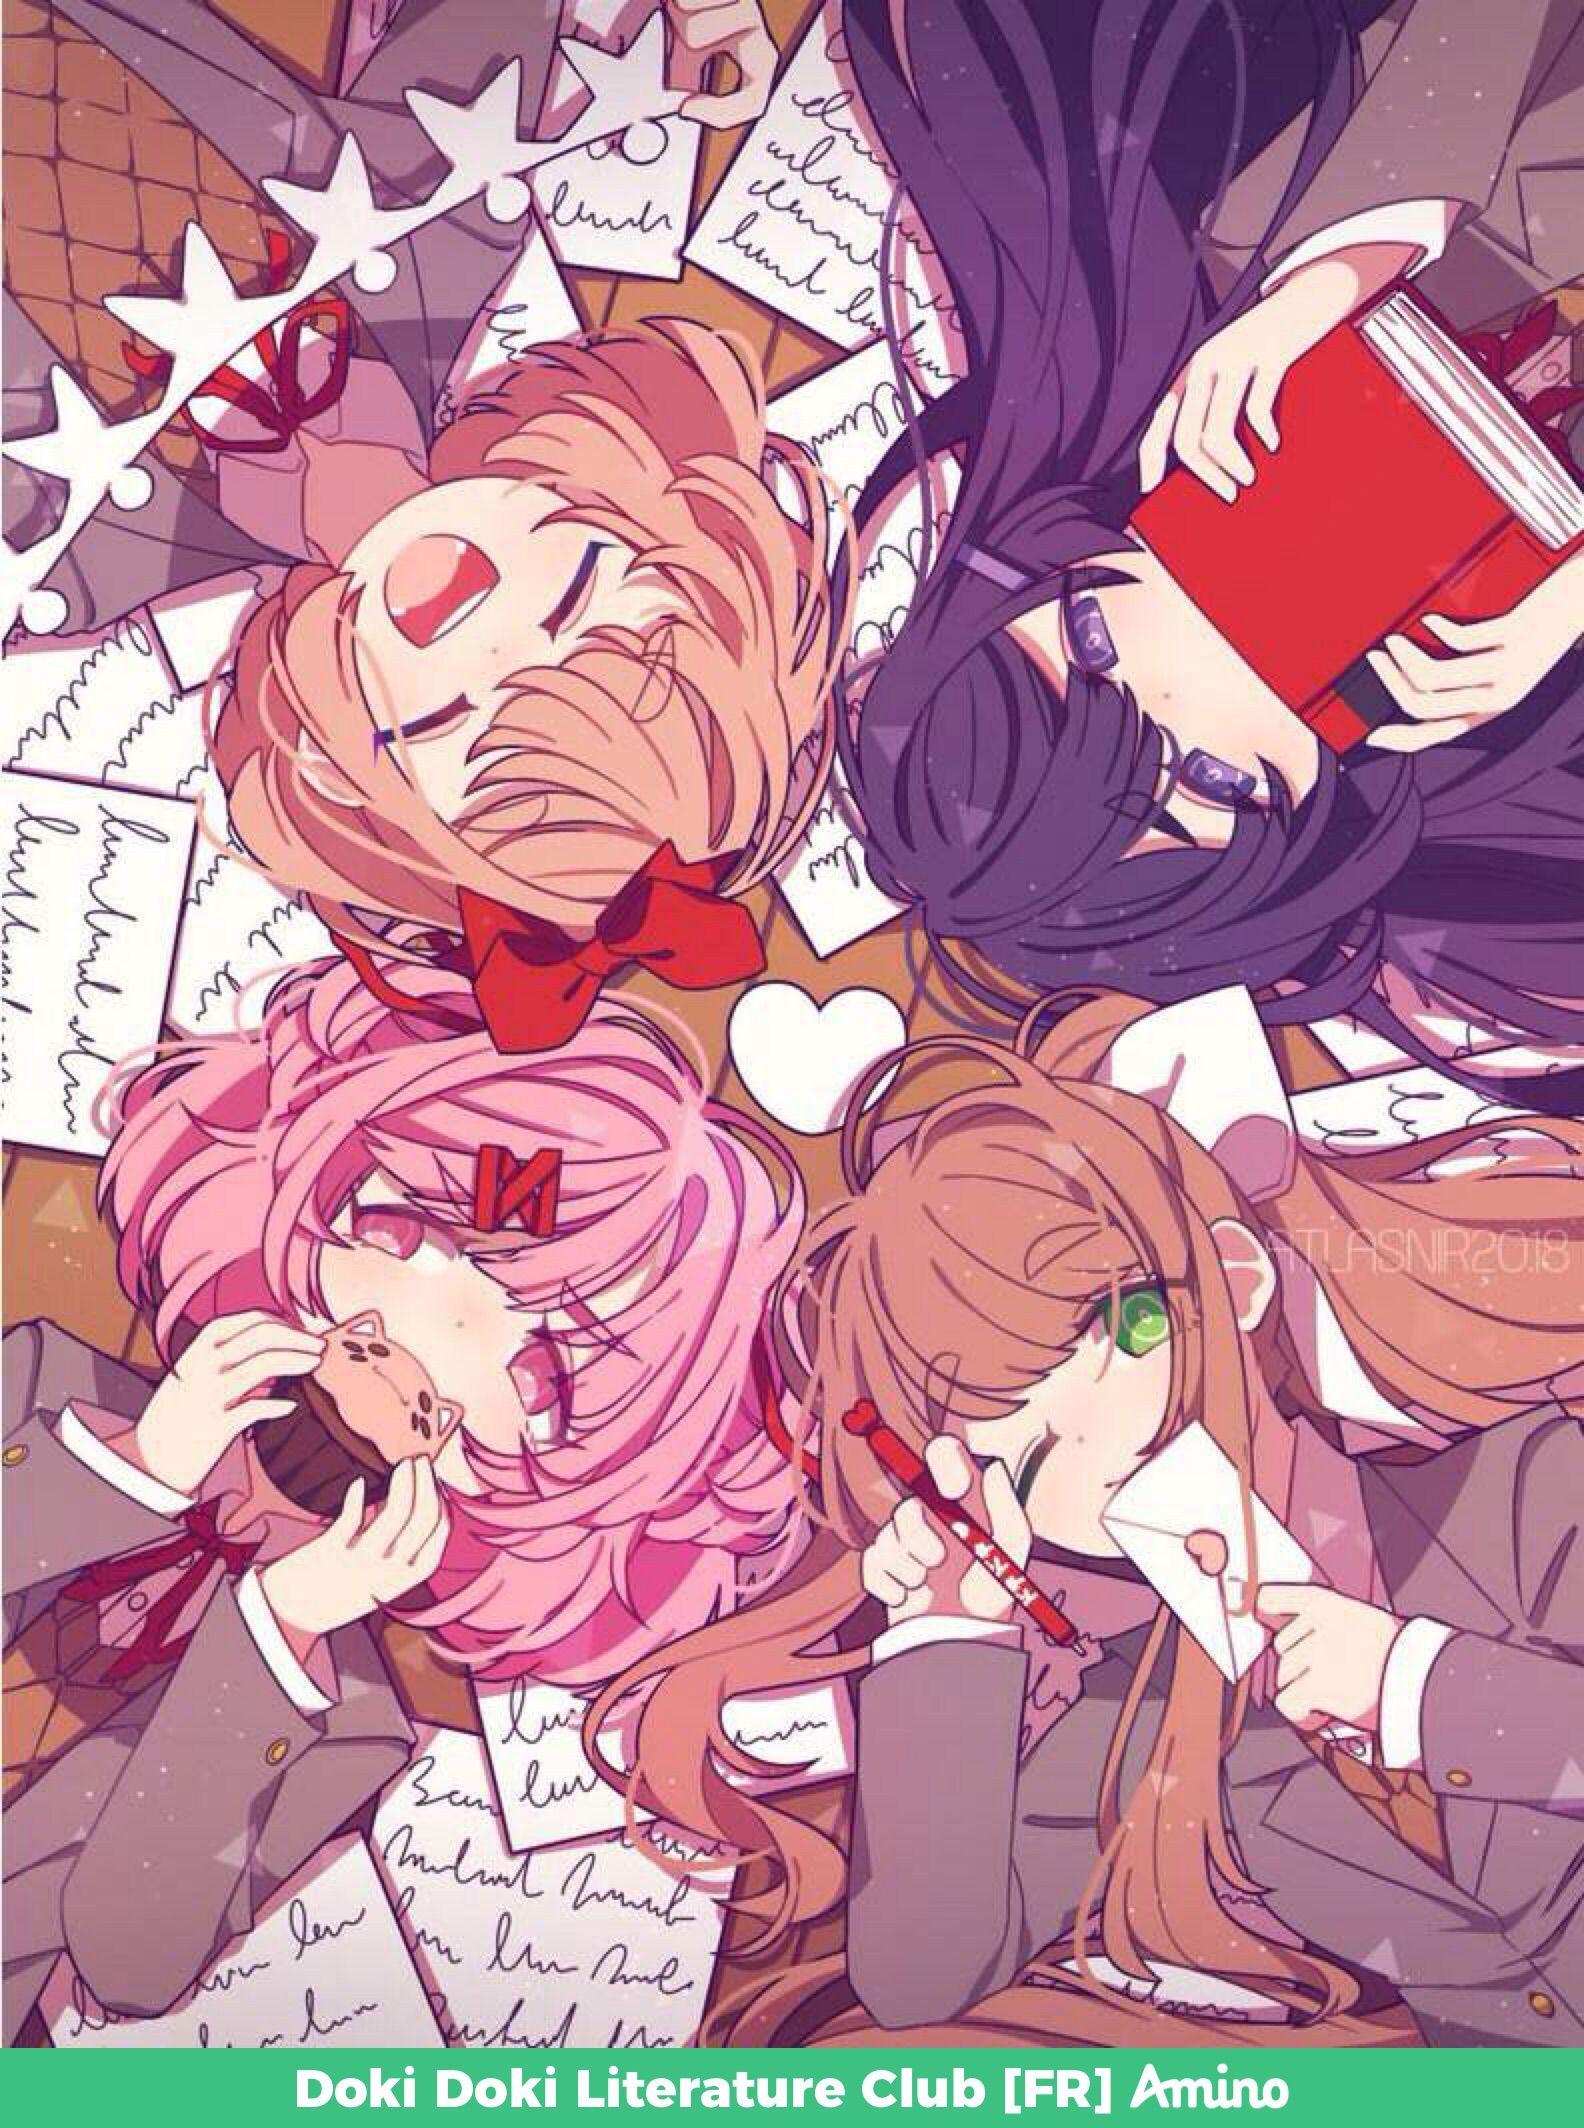 Doki Doki Literature Club - APK Direct Download